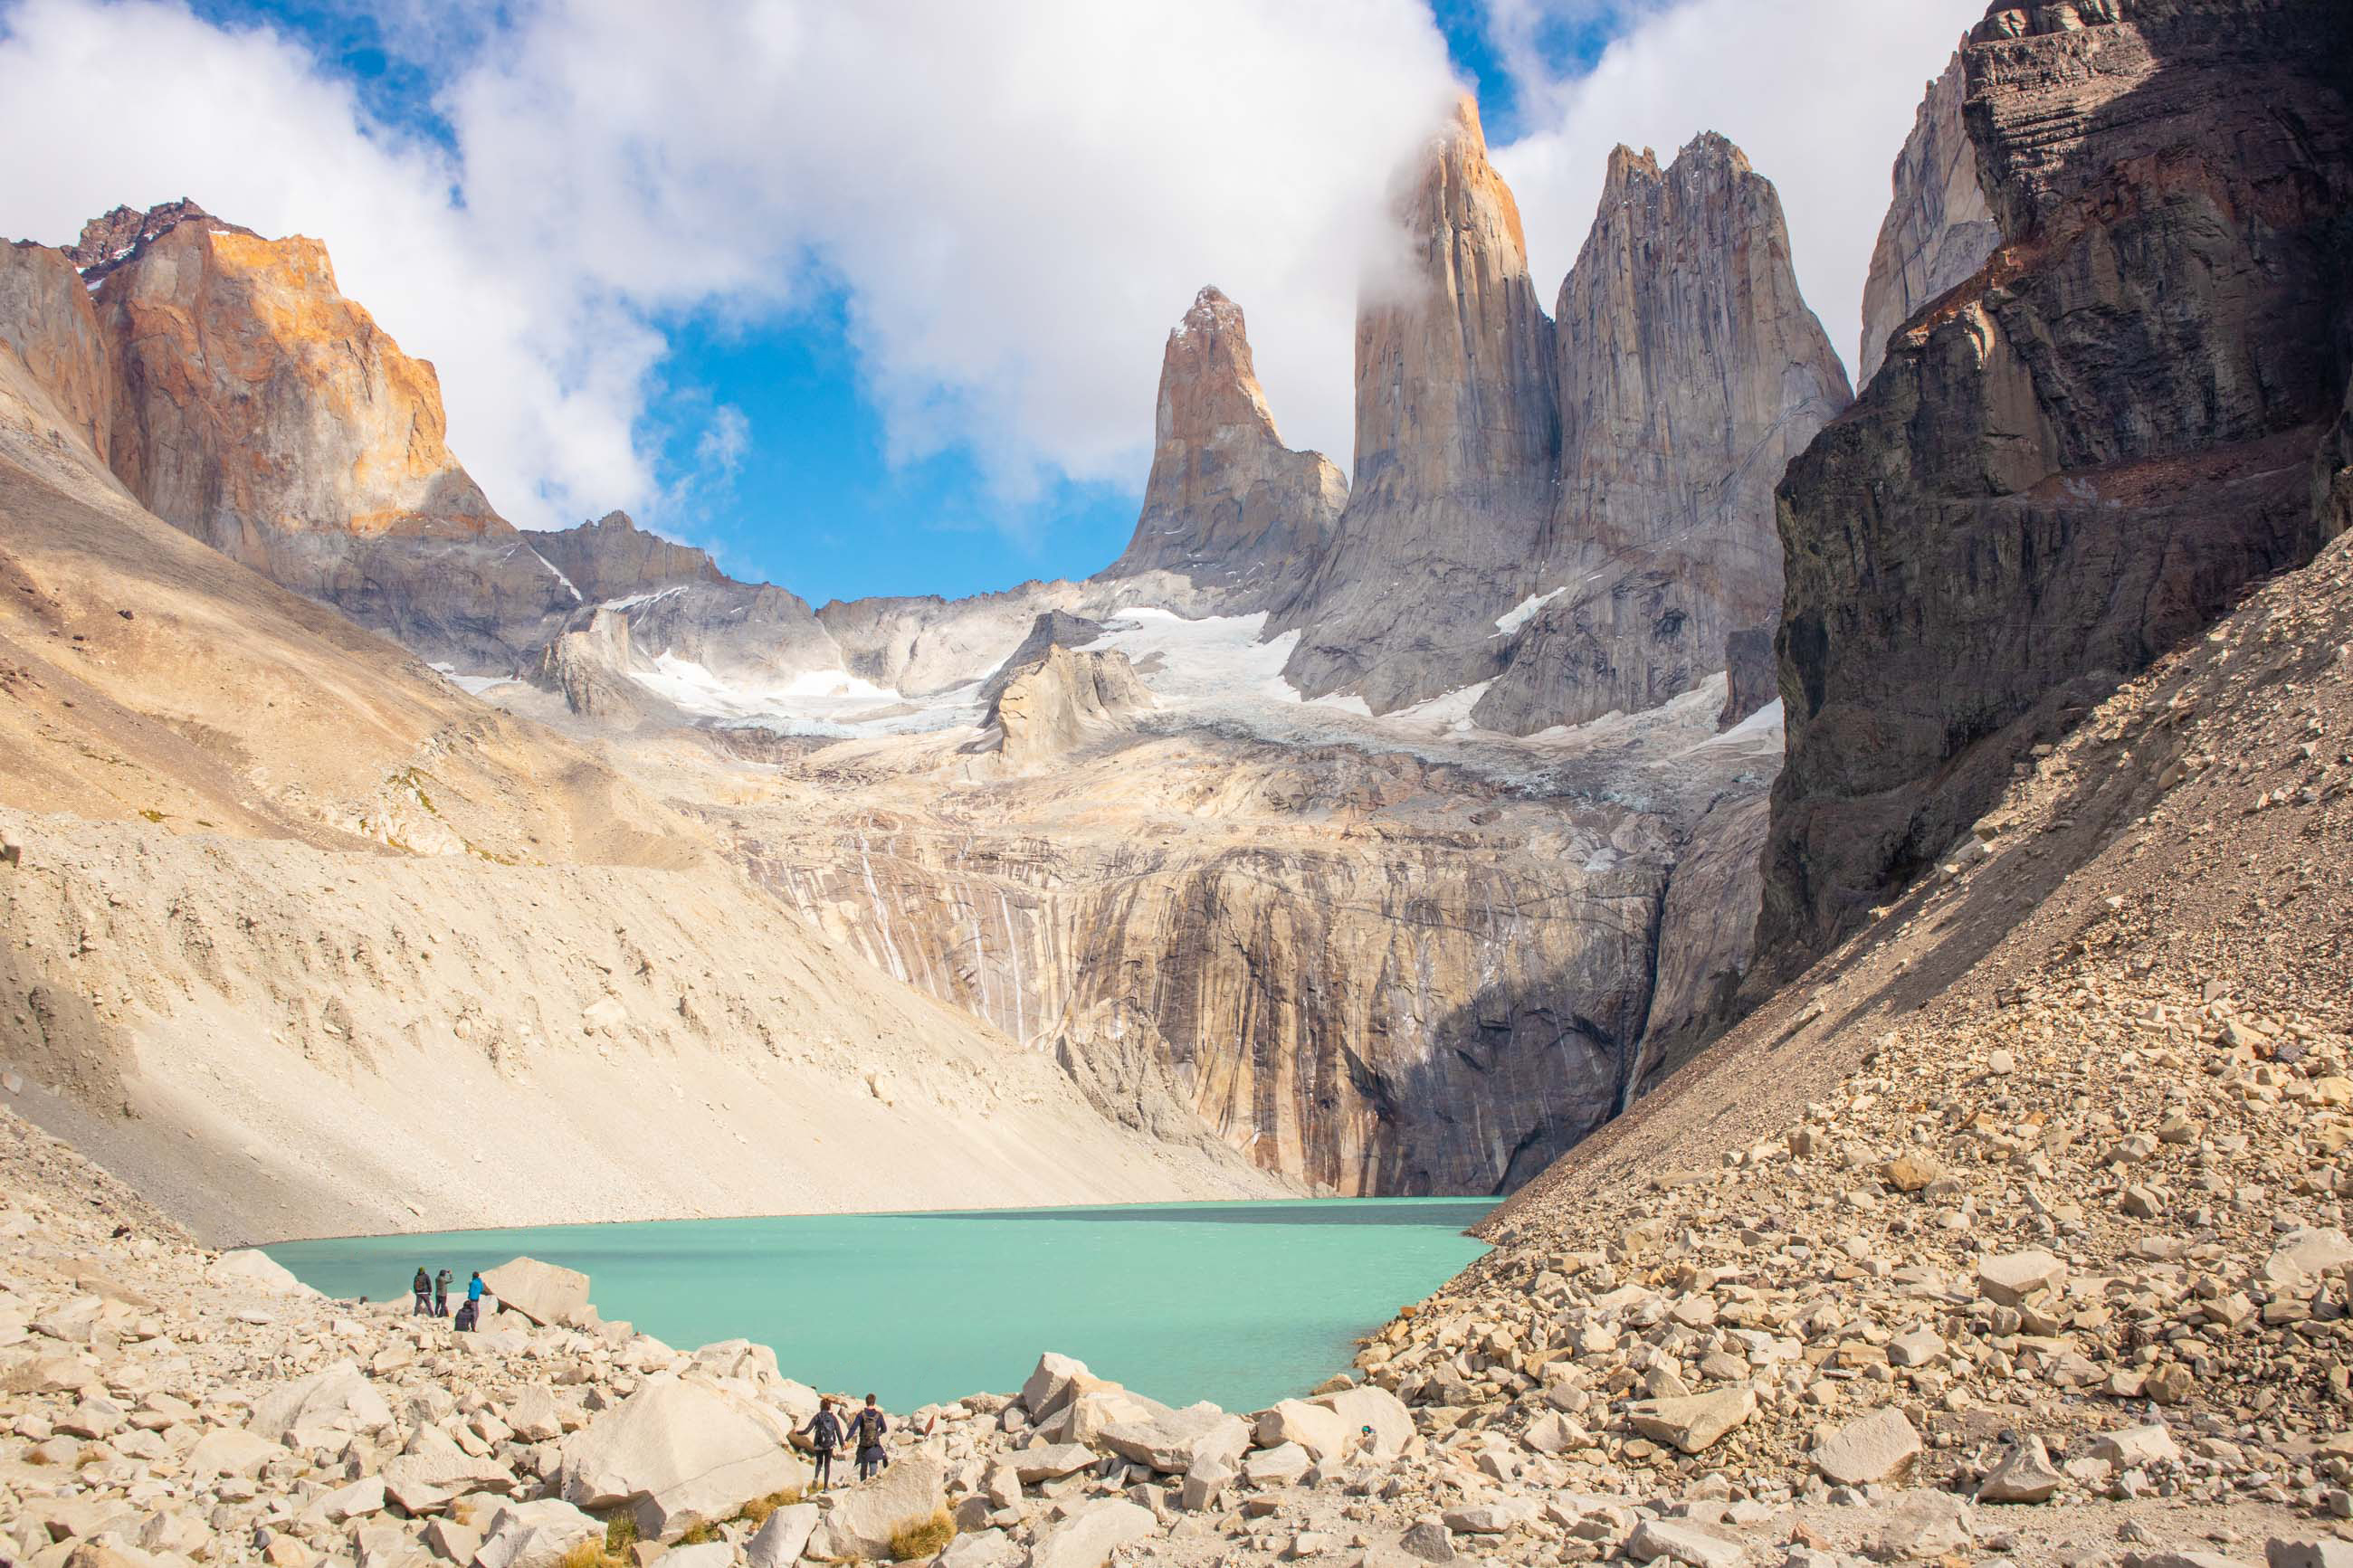 https://bubo.sk/uploads/galleries/5017/danielasnovakova_chile_patagonia_img_4293.jpg